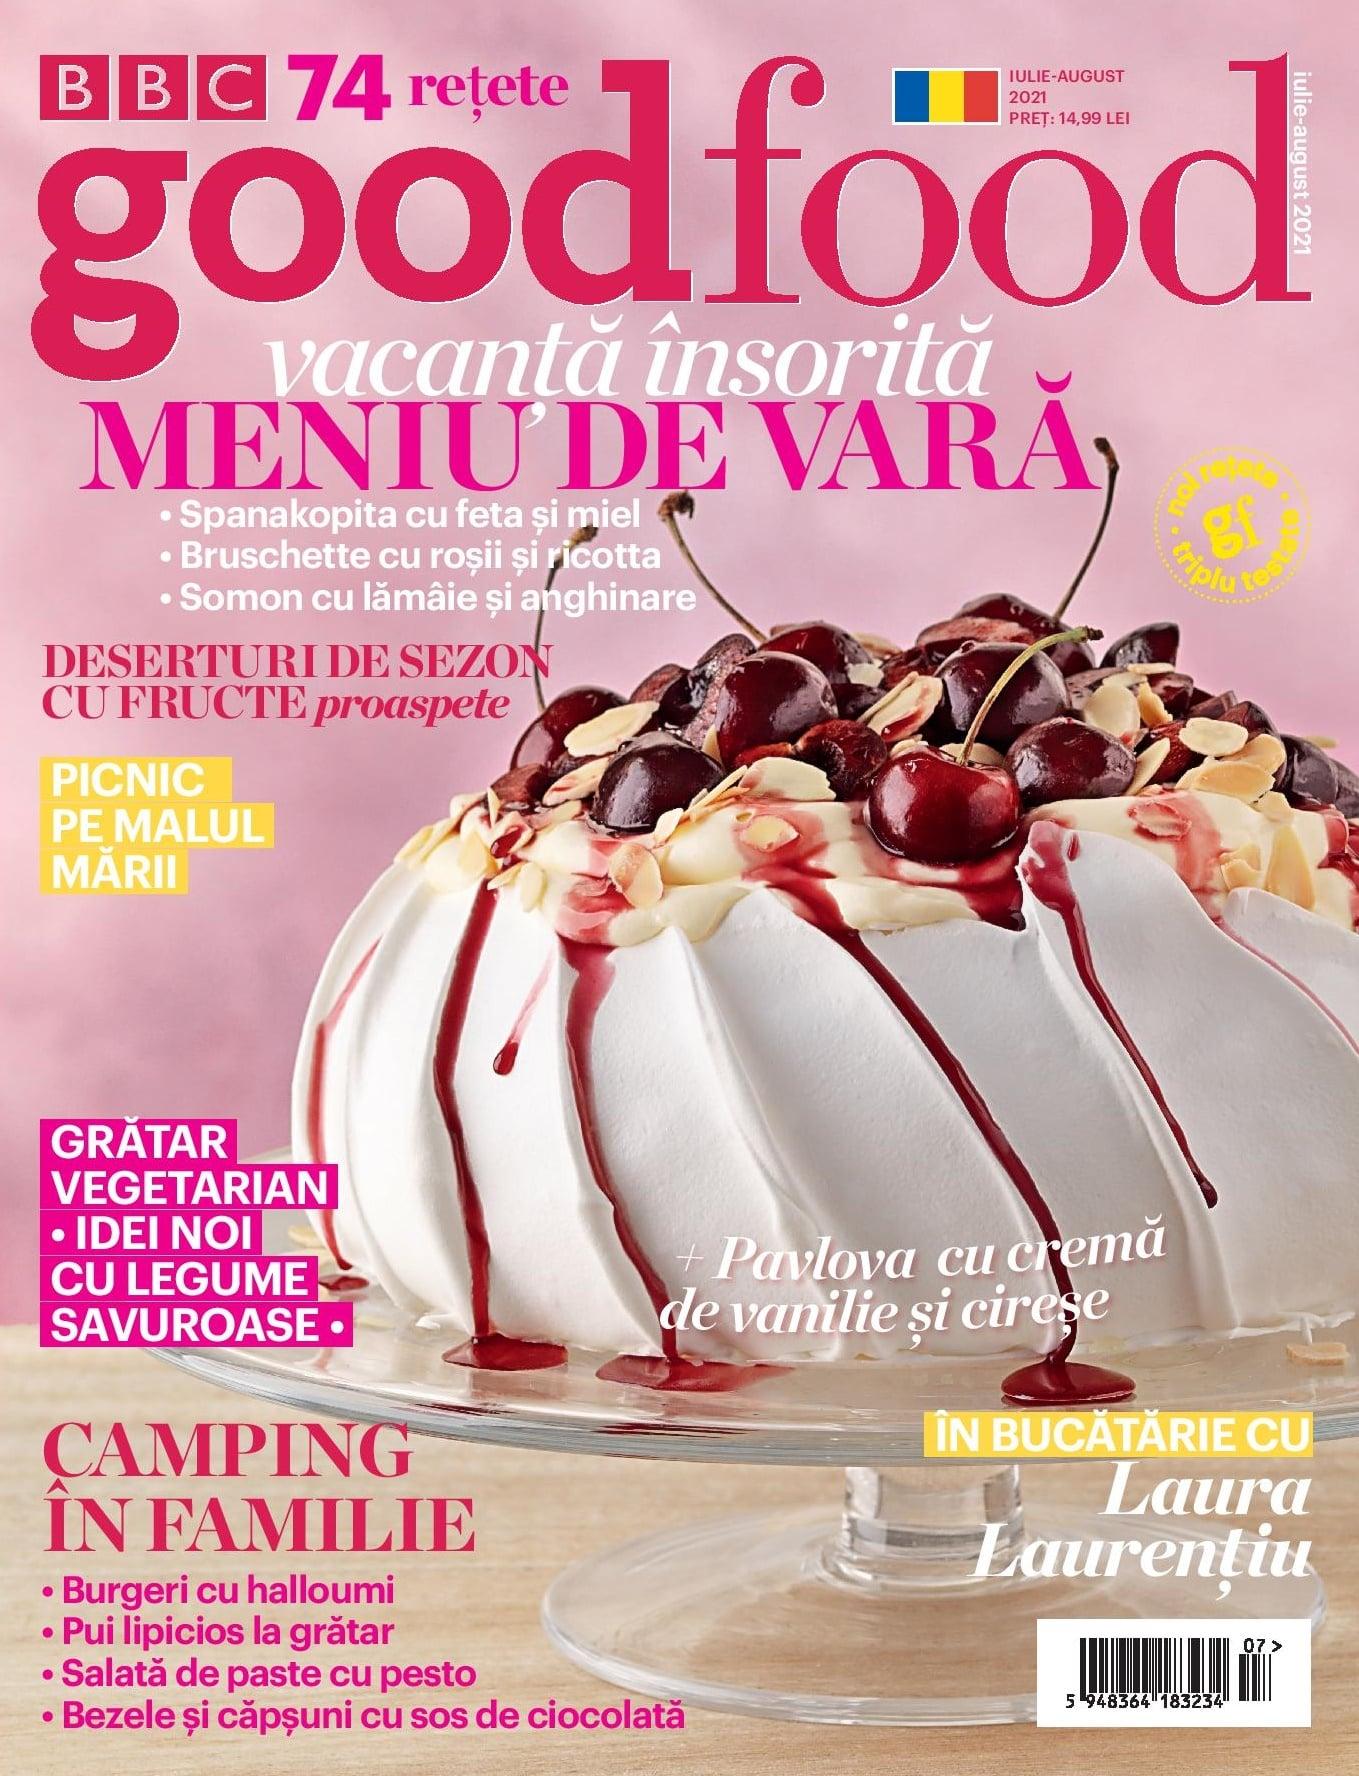 Good Food Magazine Romania ~~ Vacanta Insorita, Meniu de Vară ~~ Iulie-August 2021